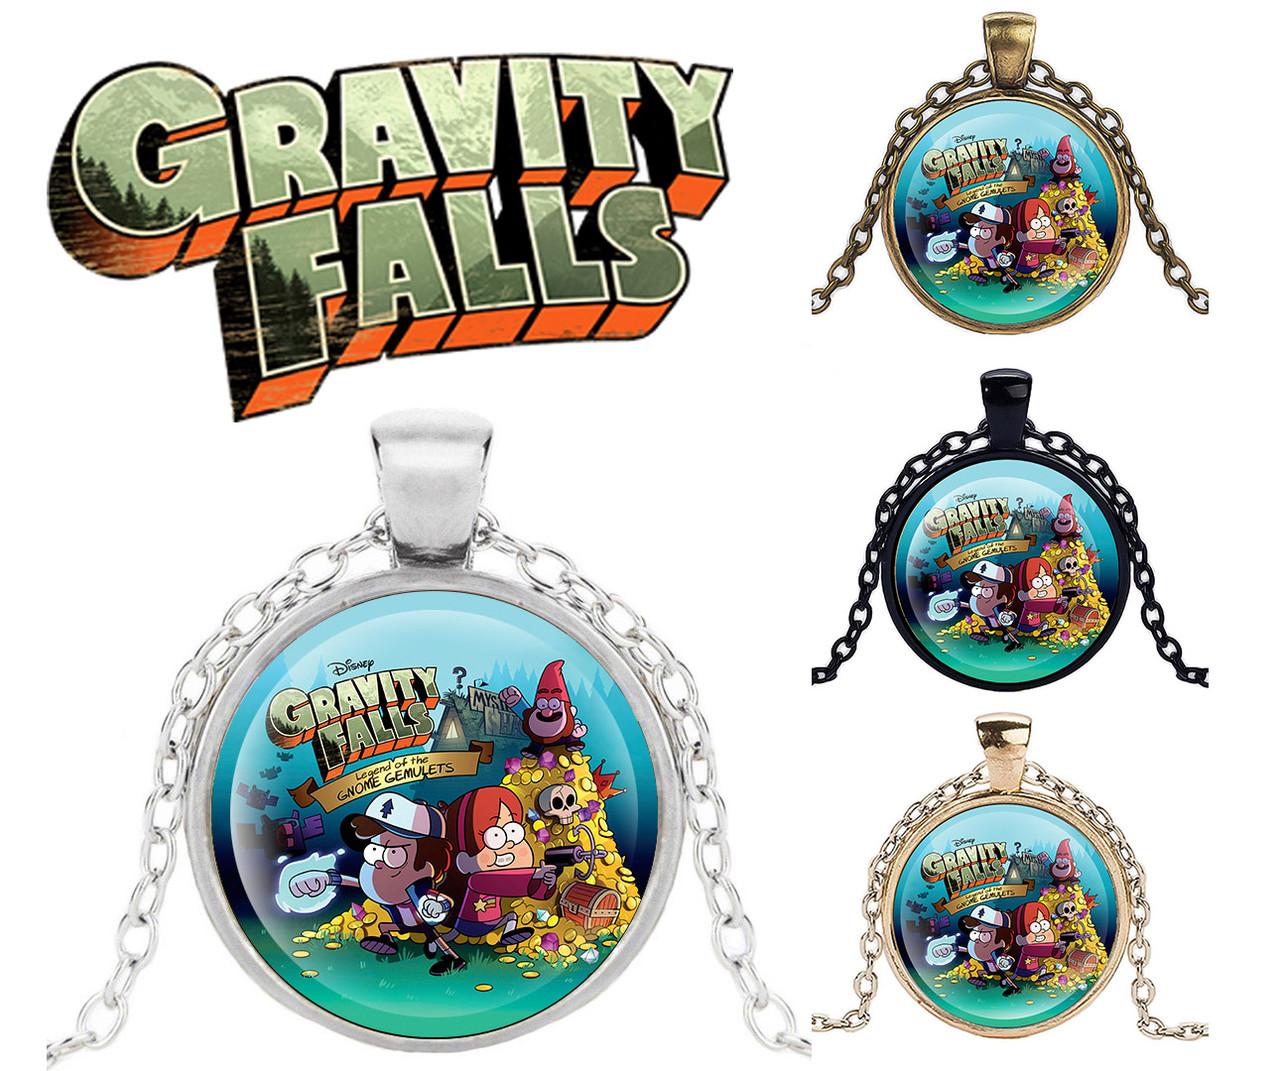 Кулон Gravity Falls Гравити Фолз со всеми персонажами